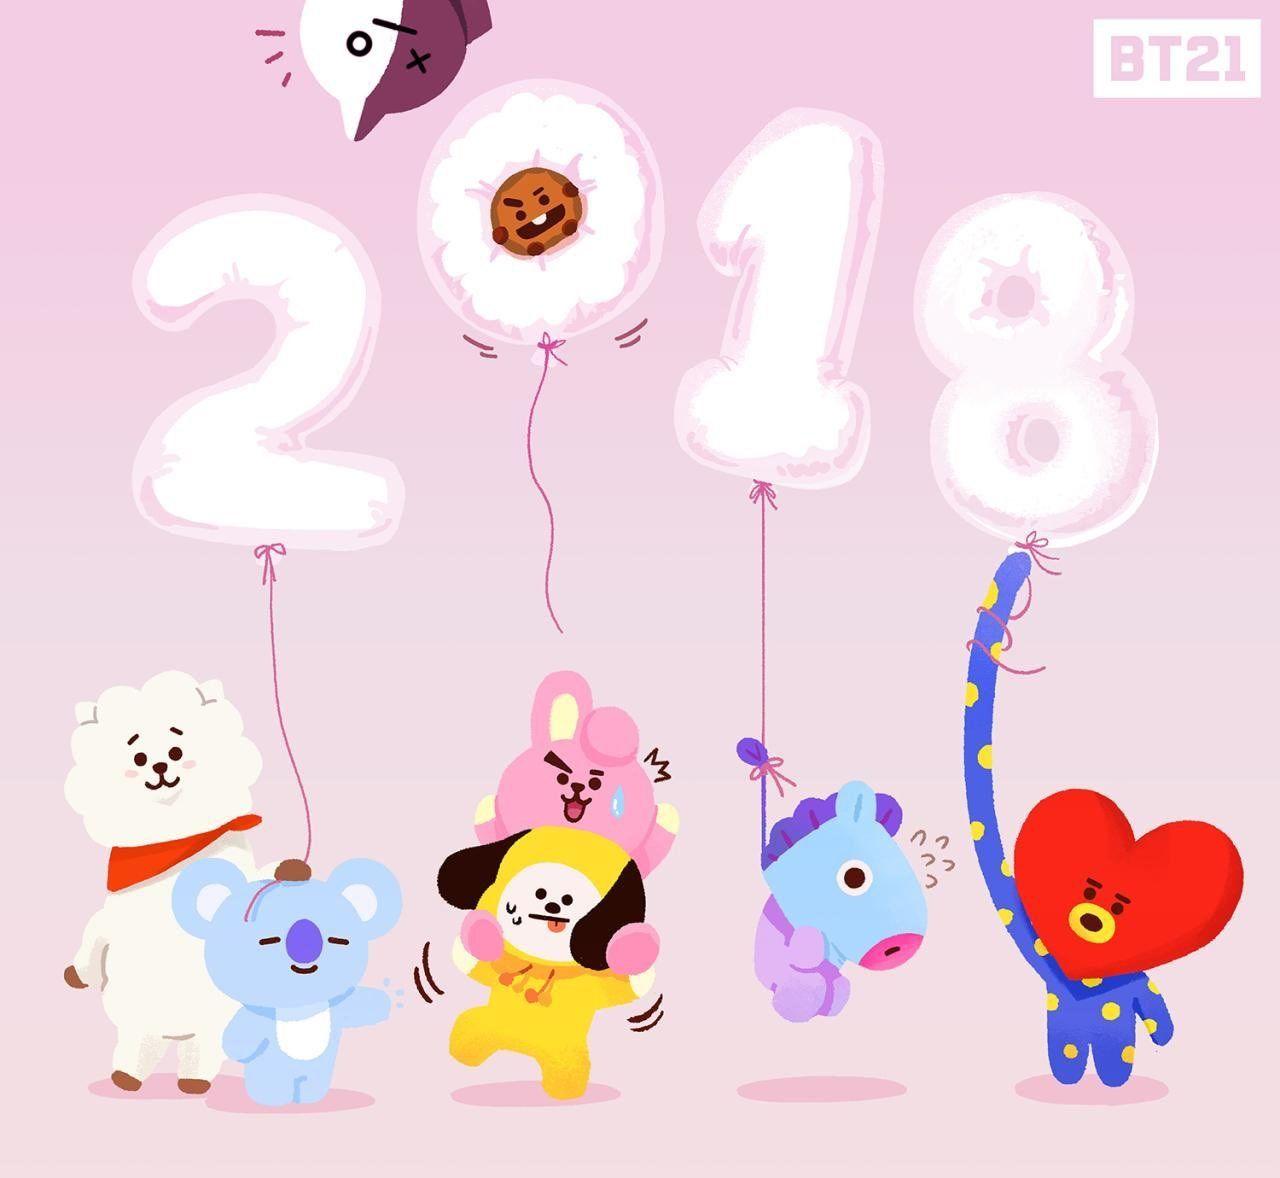 happy new year bt21 2018